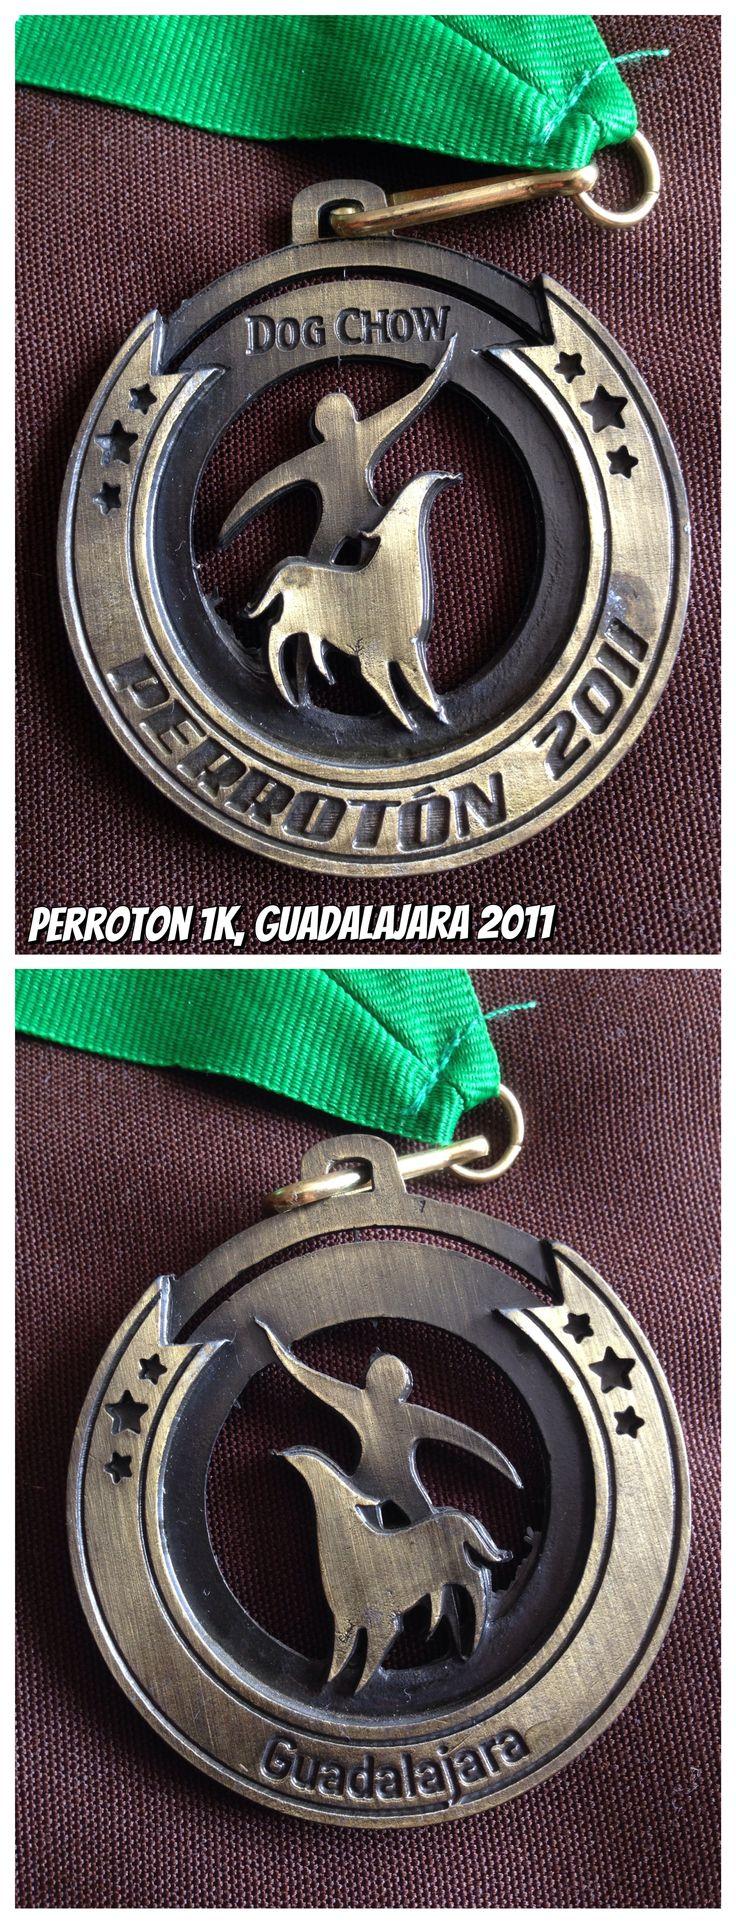 Perroton 1K @ GDL 2011